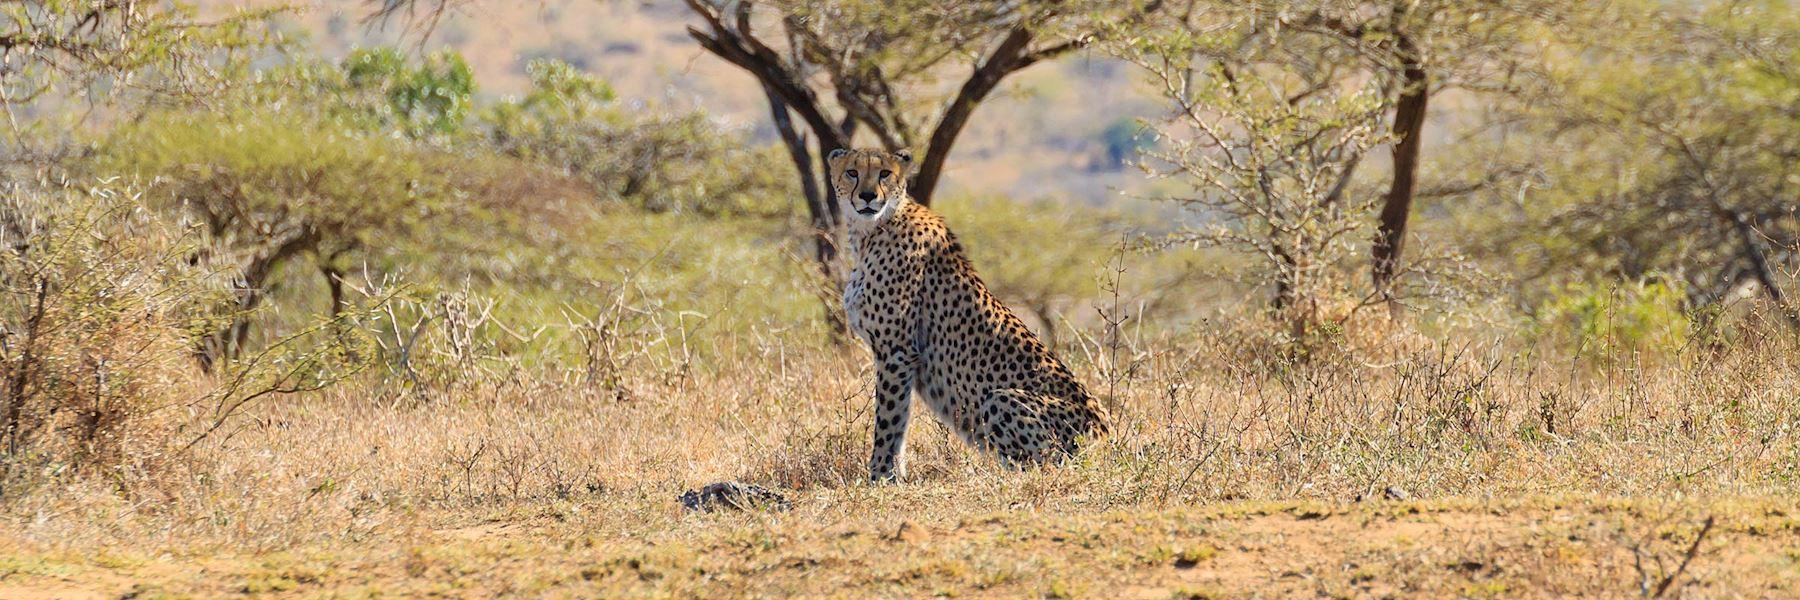 Visit Hluhluwe-IMfolozi Game Reserve, South Africa